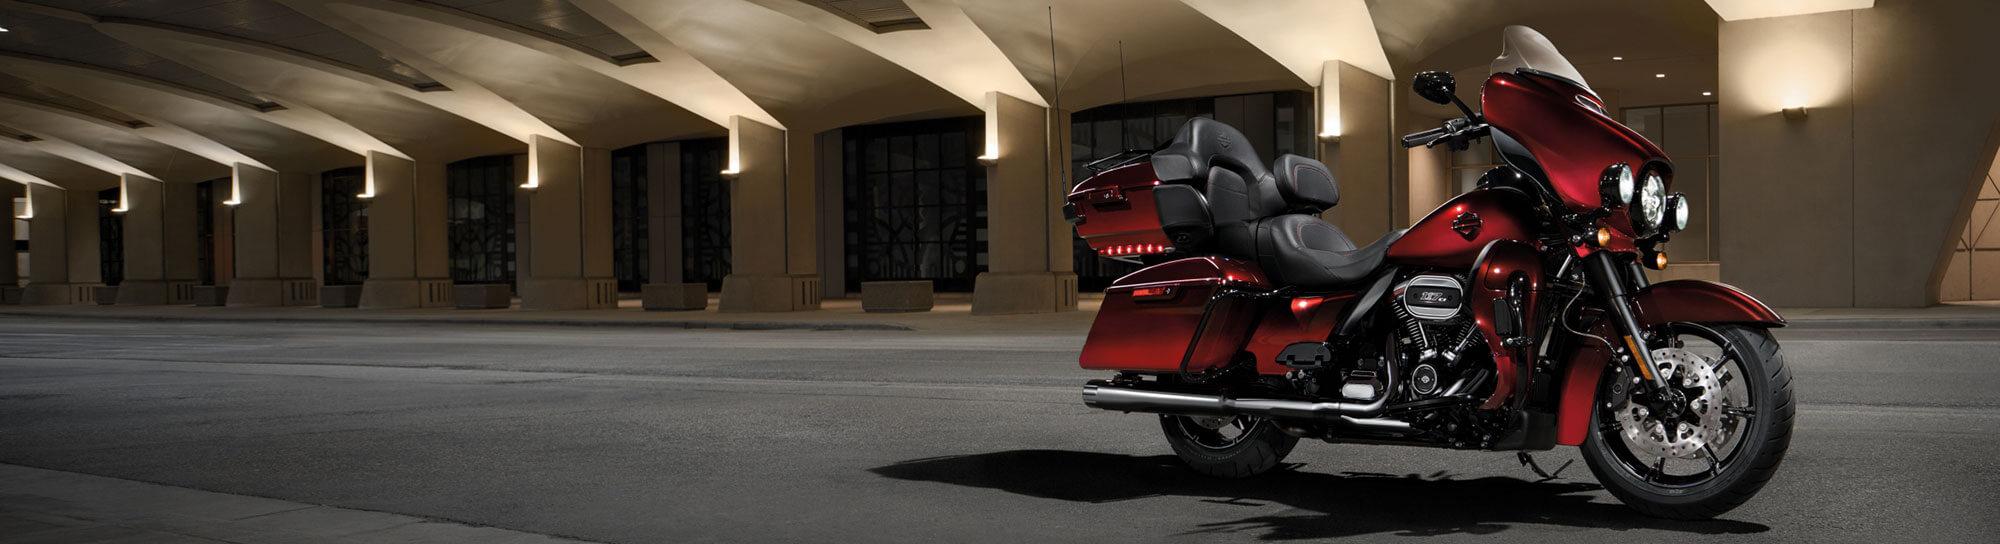 Harley-Davidson CVO Limited 115th Anniversary